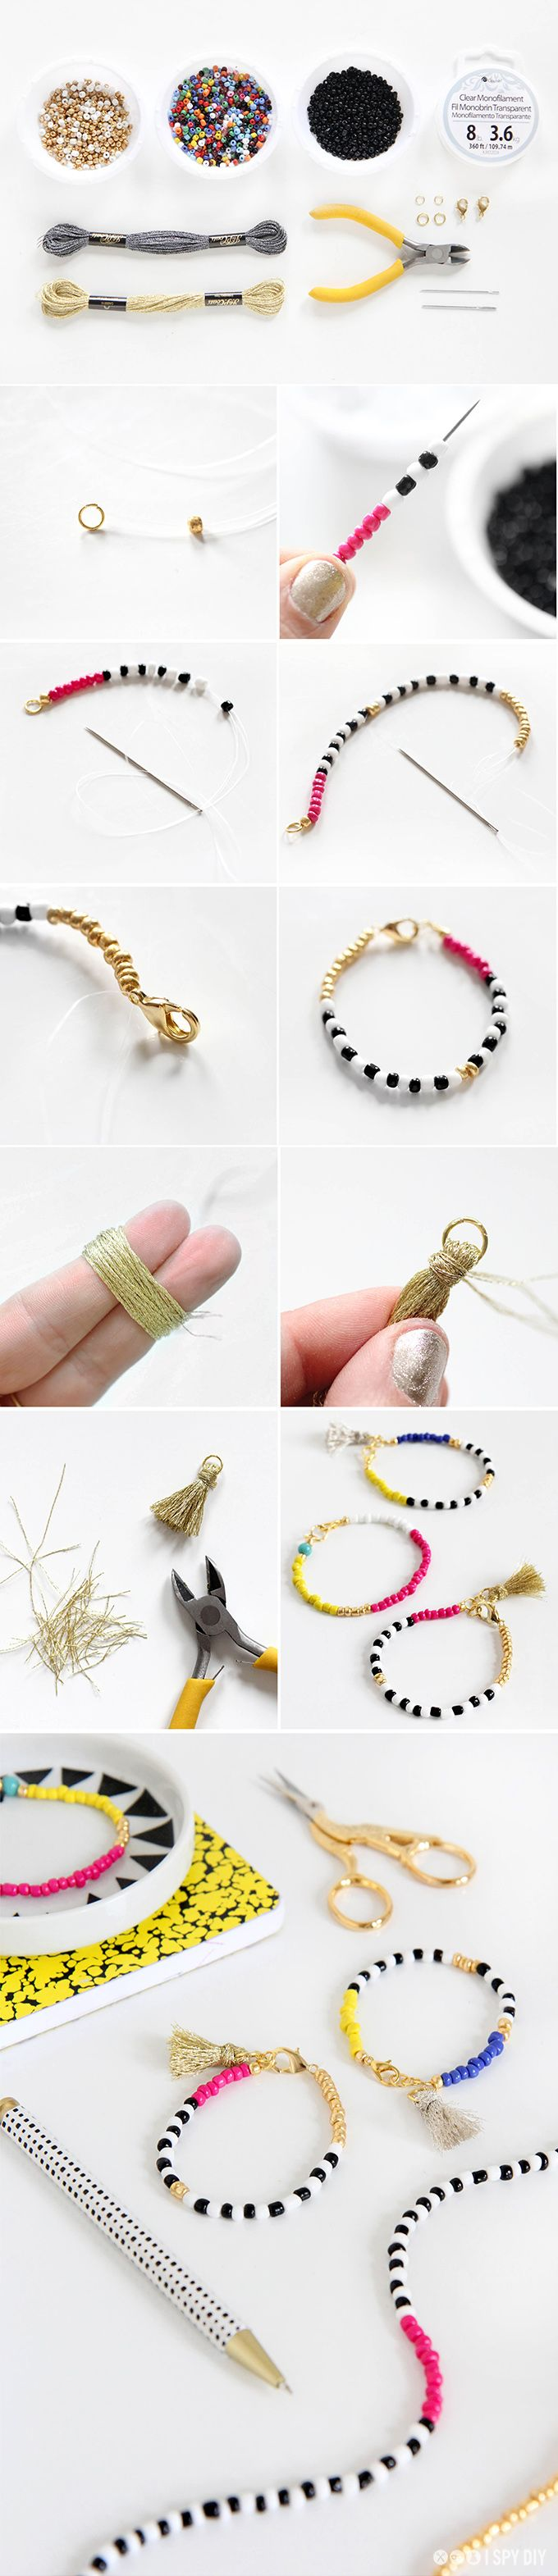 My diy tassels beads and diy tassel